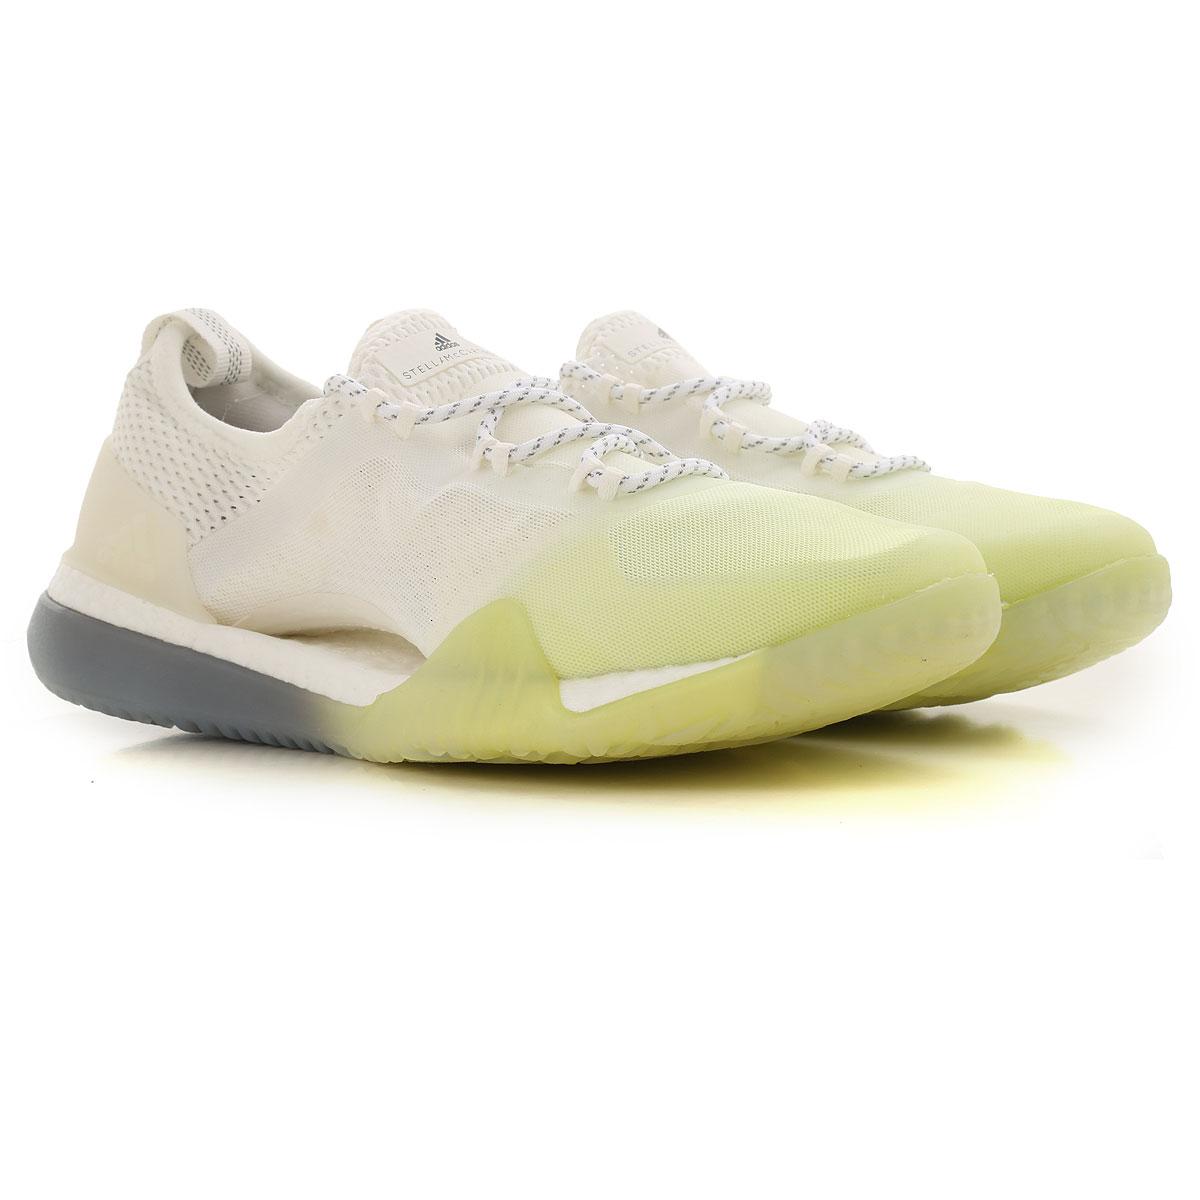 new product 5c428 99720 Adidas Tênis para Mulher Baratos em Promoção Outlet, Stella Mccartney,  Branco, Synthetic Textile